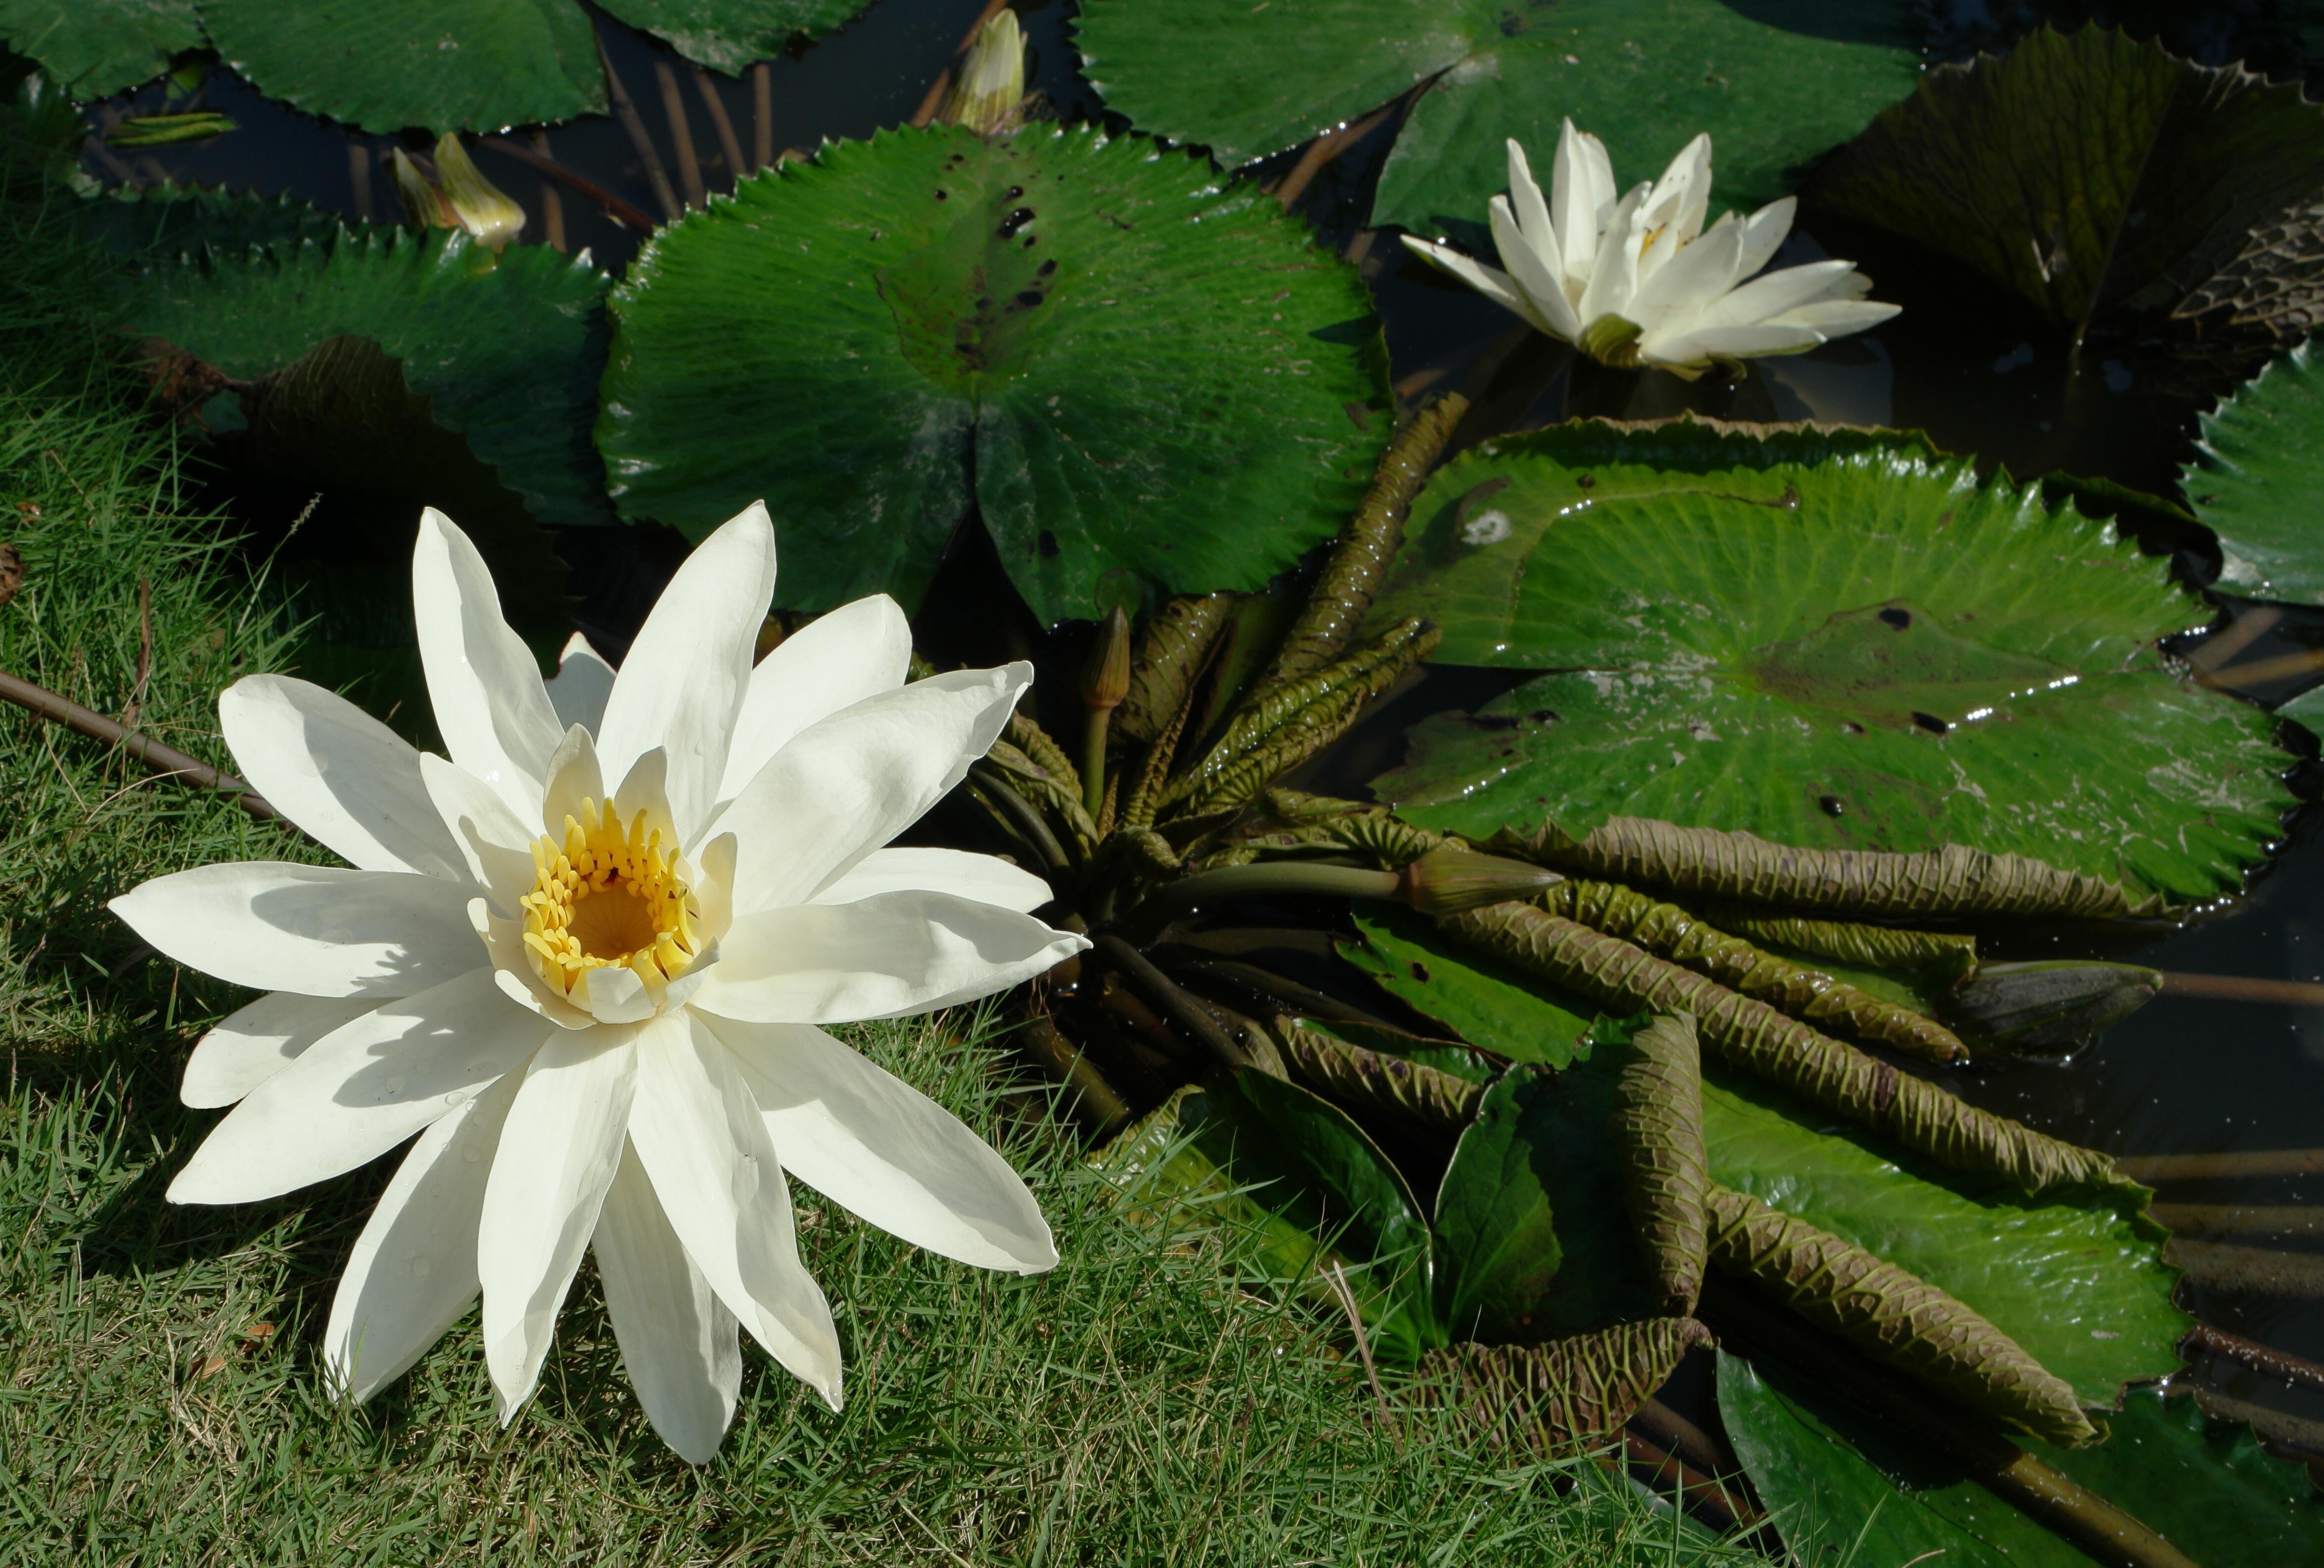 Fotos gratis : naturaleza, blanco, hoja, verde, botánica, jardín ...